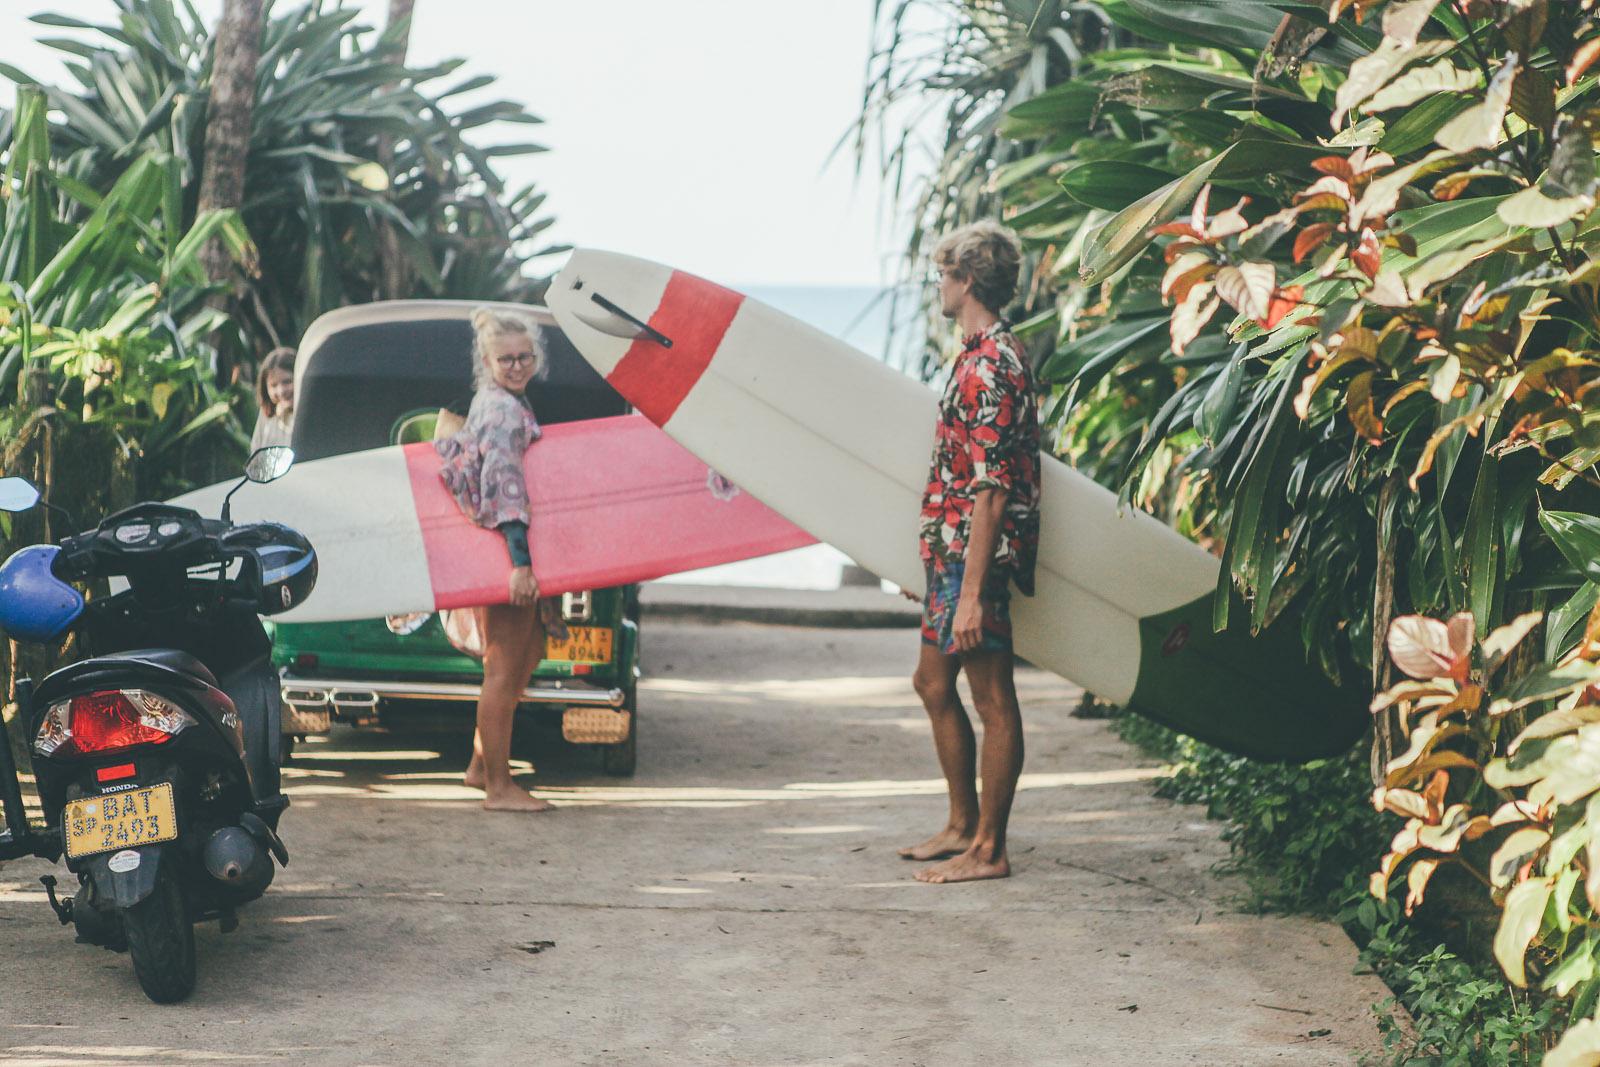 Sunshinestories-Sri-Lanka-Medawatta-Medawata-Meda-Watta-Mada-surf-Lonboard-Surfing-Wave-Surf-School-Camp-Yoga-Studio-IMG_0790